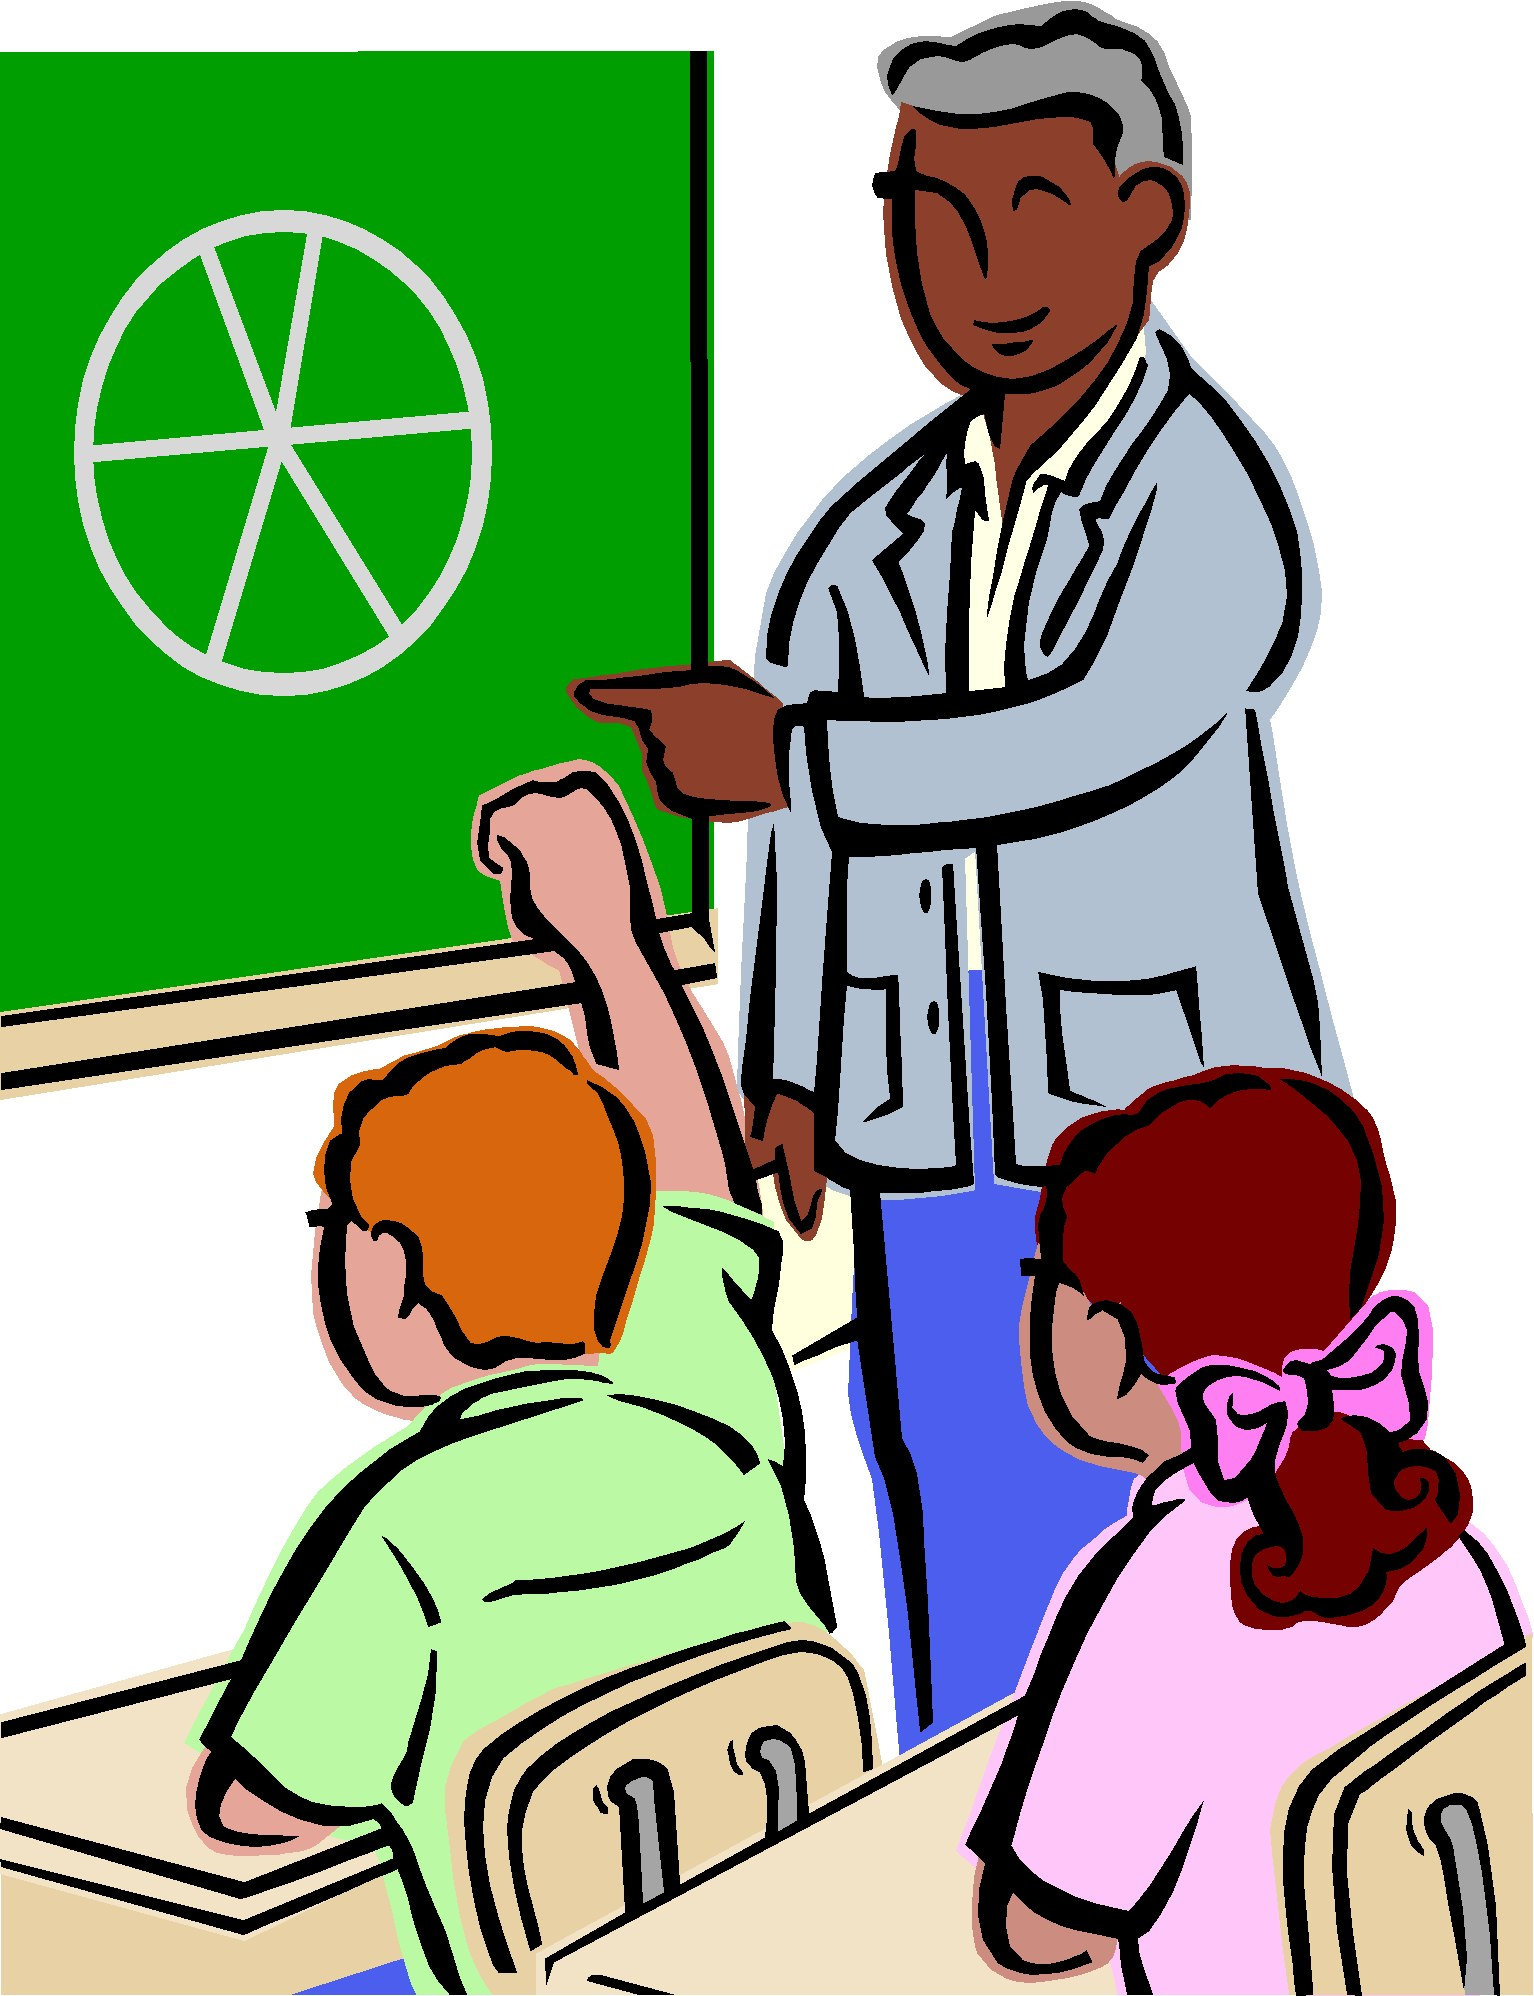 Clip Art Free Clip Art For Teachers clip art for teachers free clipart panda images teachers